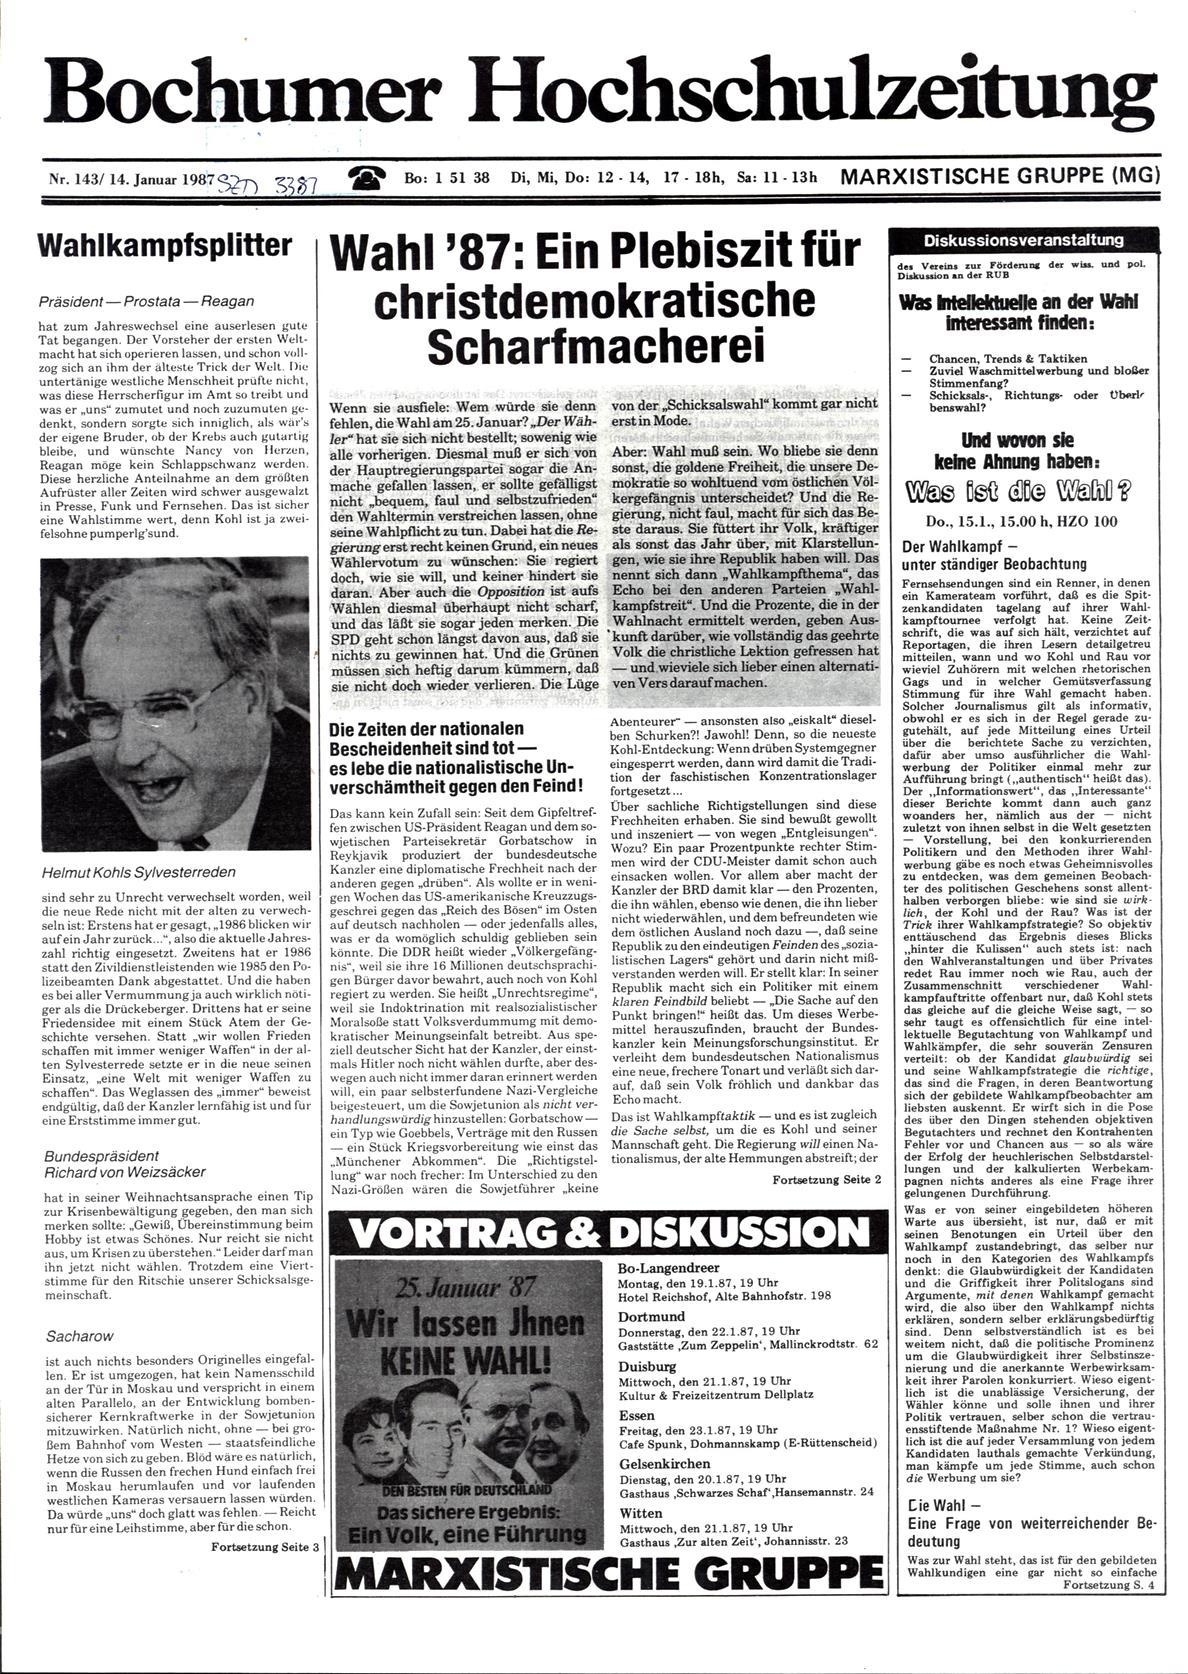 Bochum_BHZ_19870114_143_001